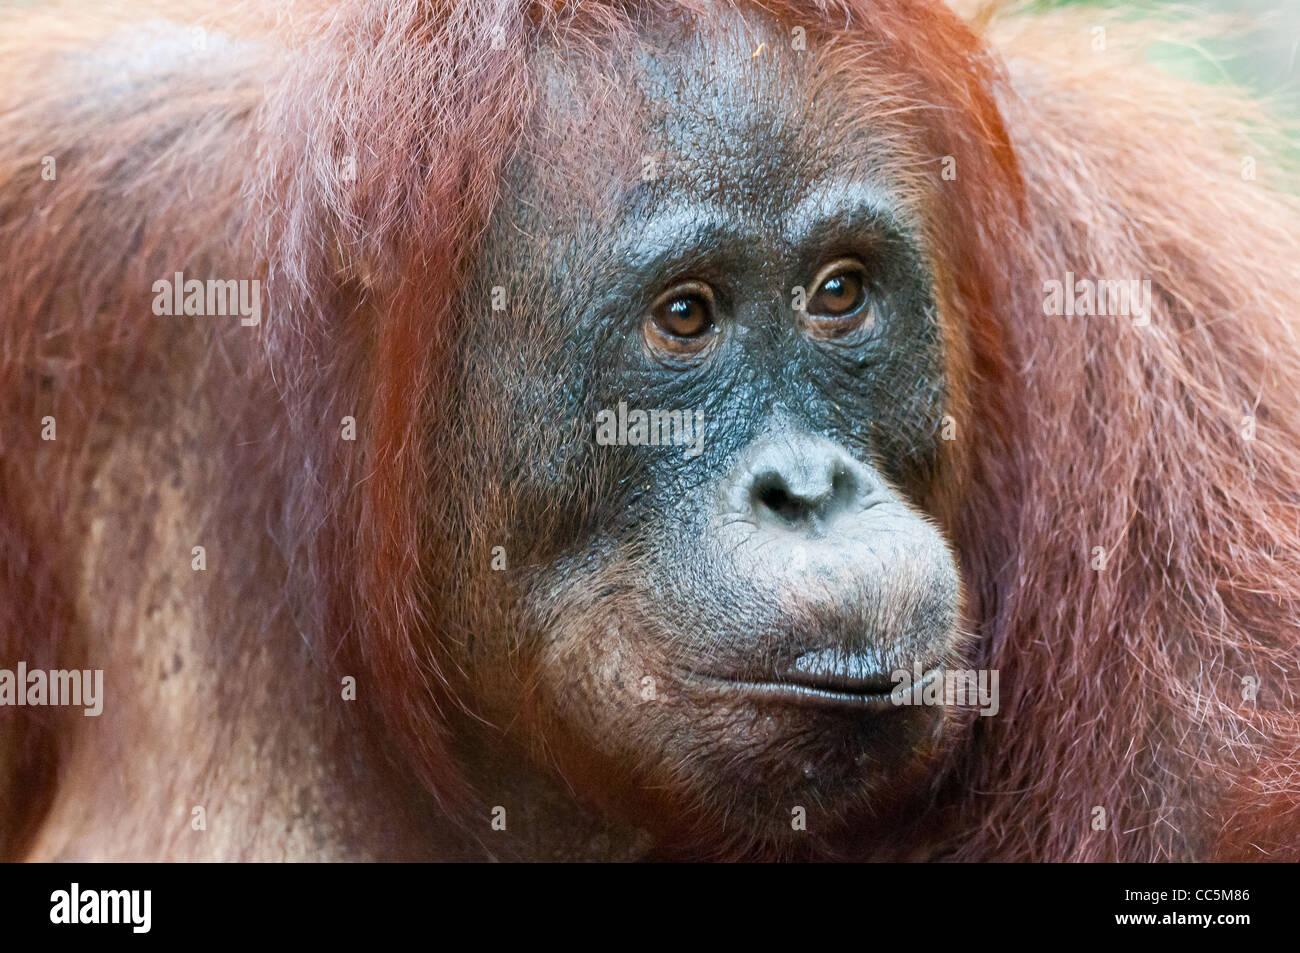 A close portrait of a wild but habituated, adult female orangutan, Camp Leakey, Borneo. Stock Photo